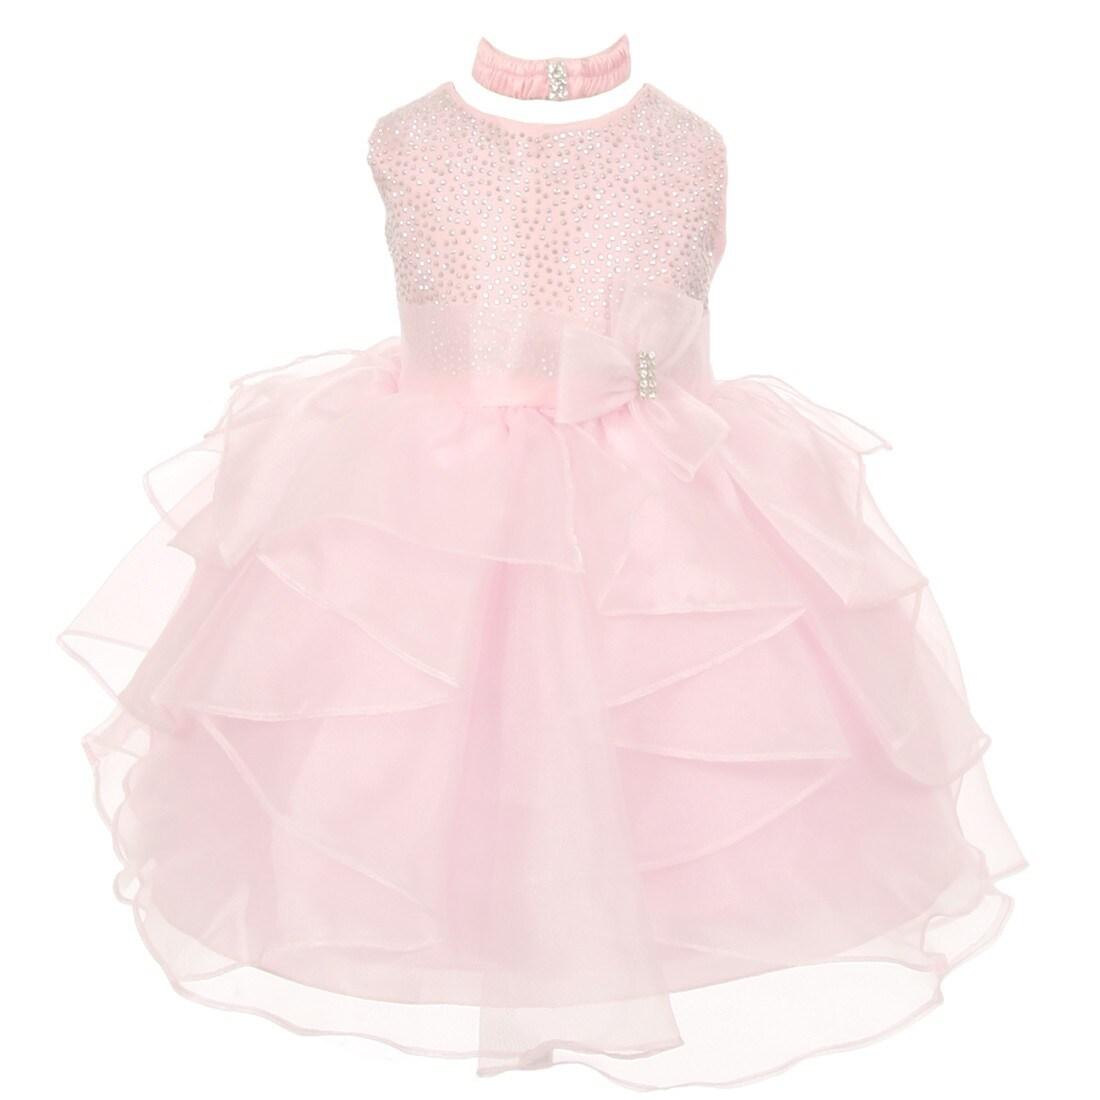 Shop Baby Girls Light Pink Organza Rhinestuds Bow Sash Flower Girl